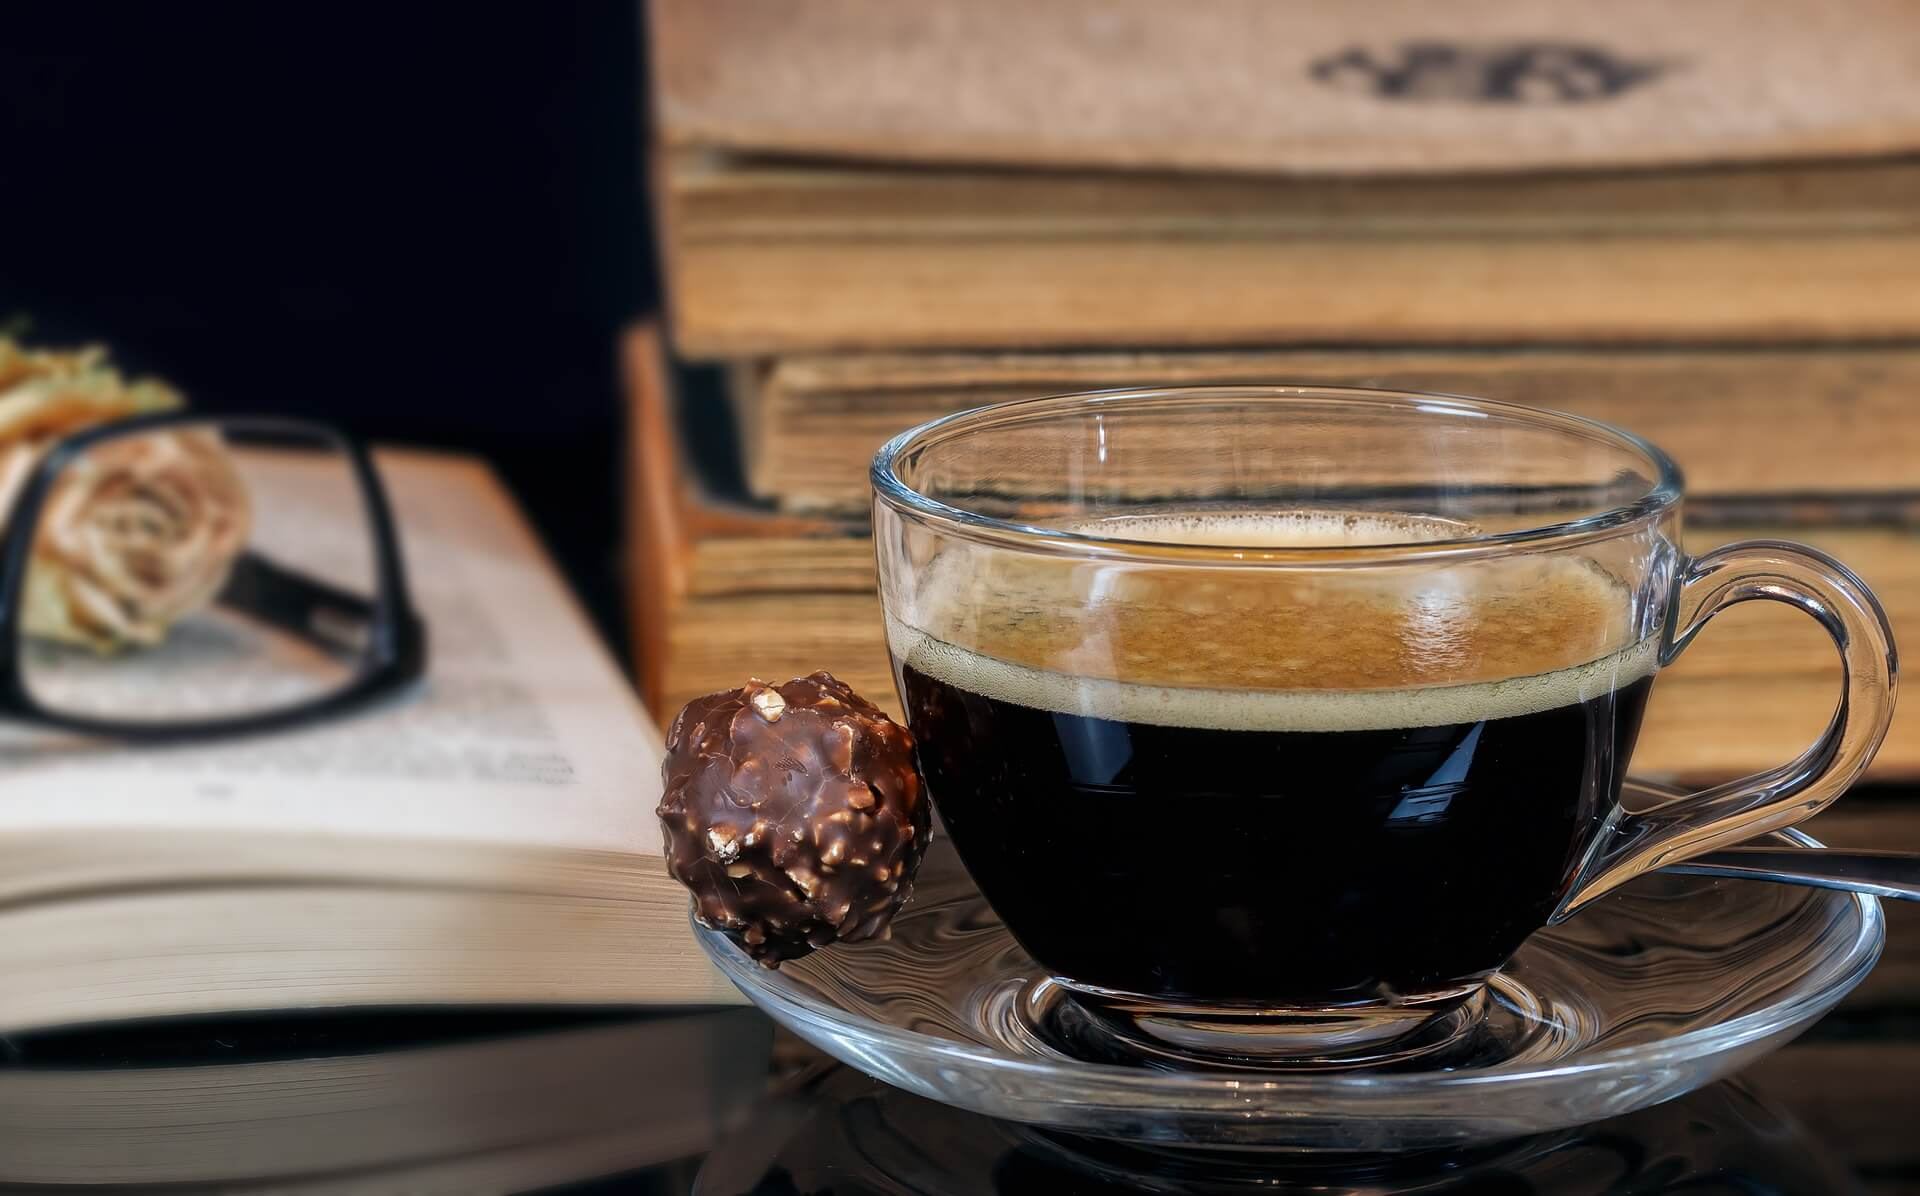 kaffee honduras header